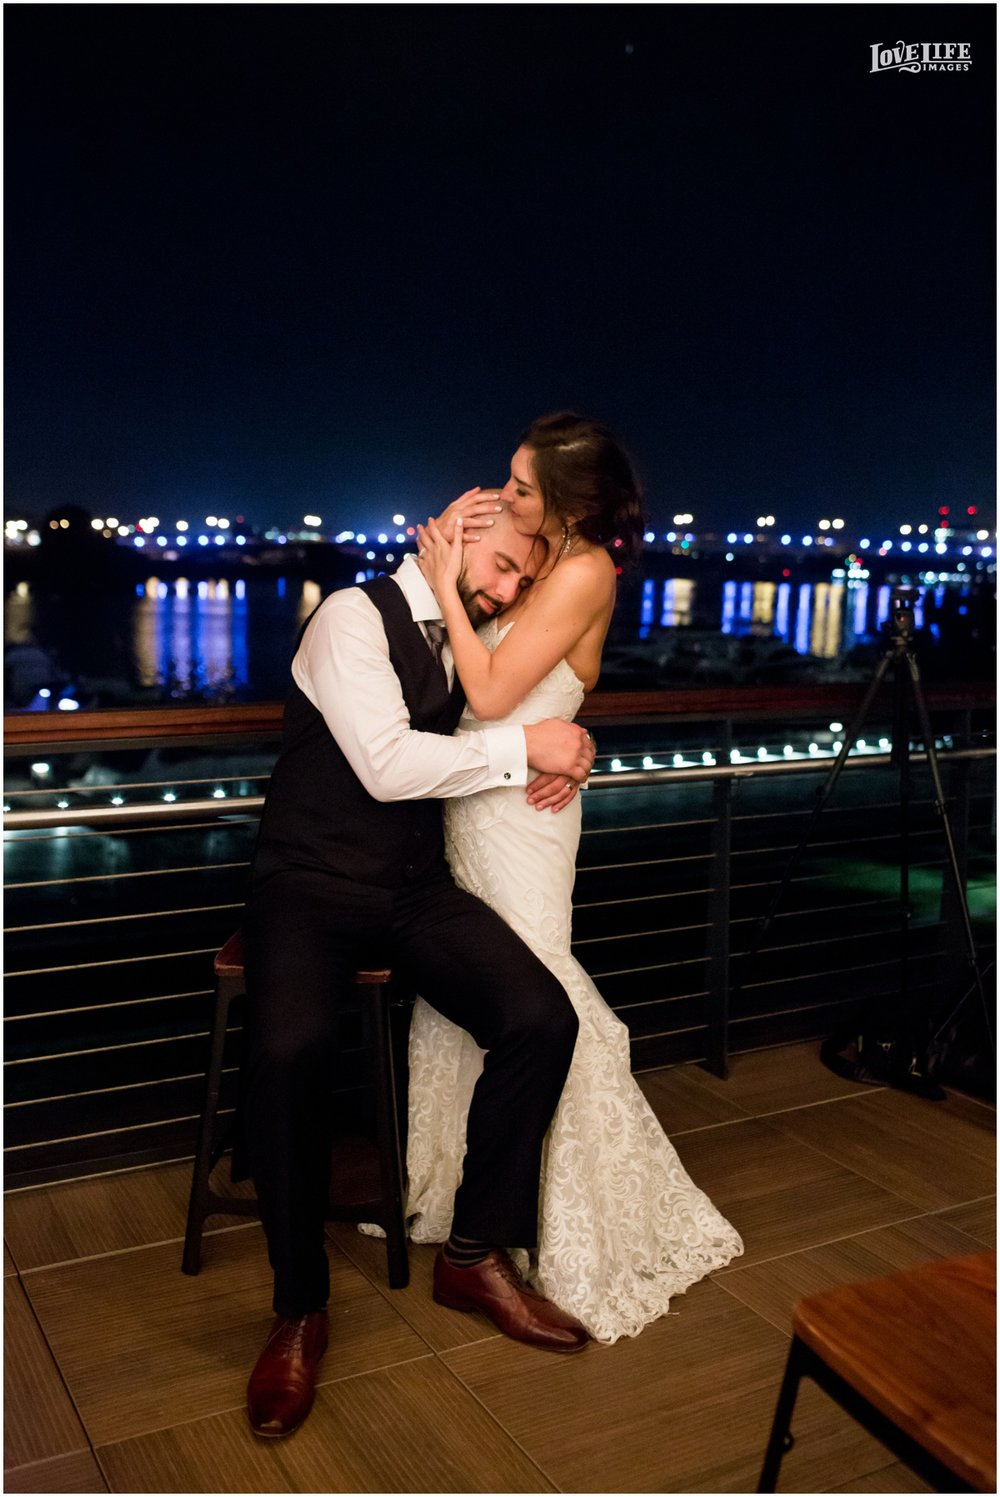 District Winery Fall DC wedding nighttime bridal portrait.JPG